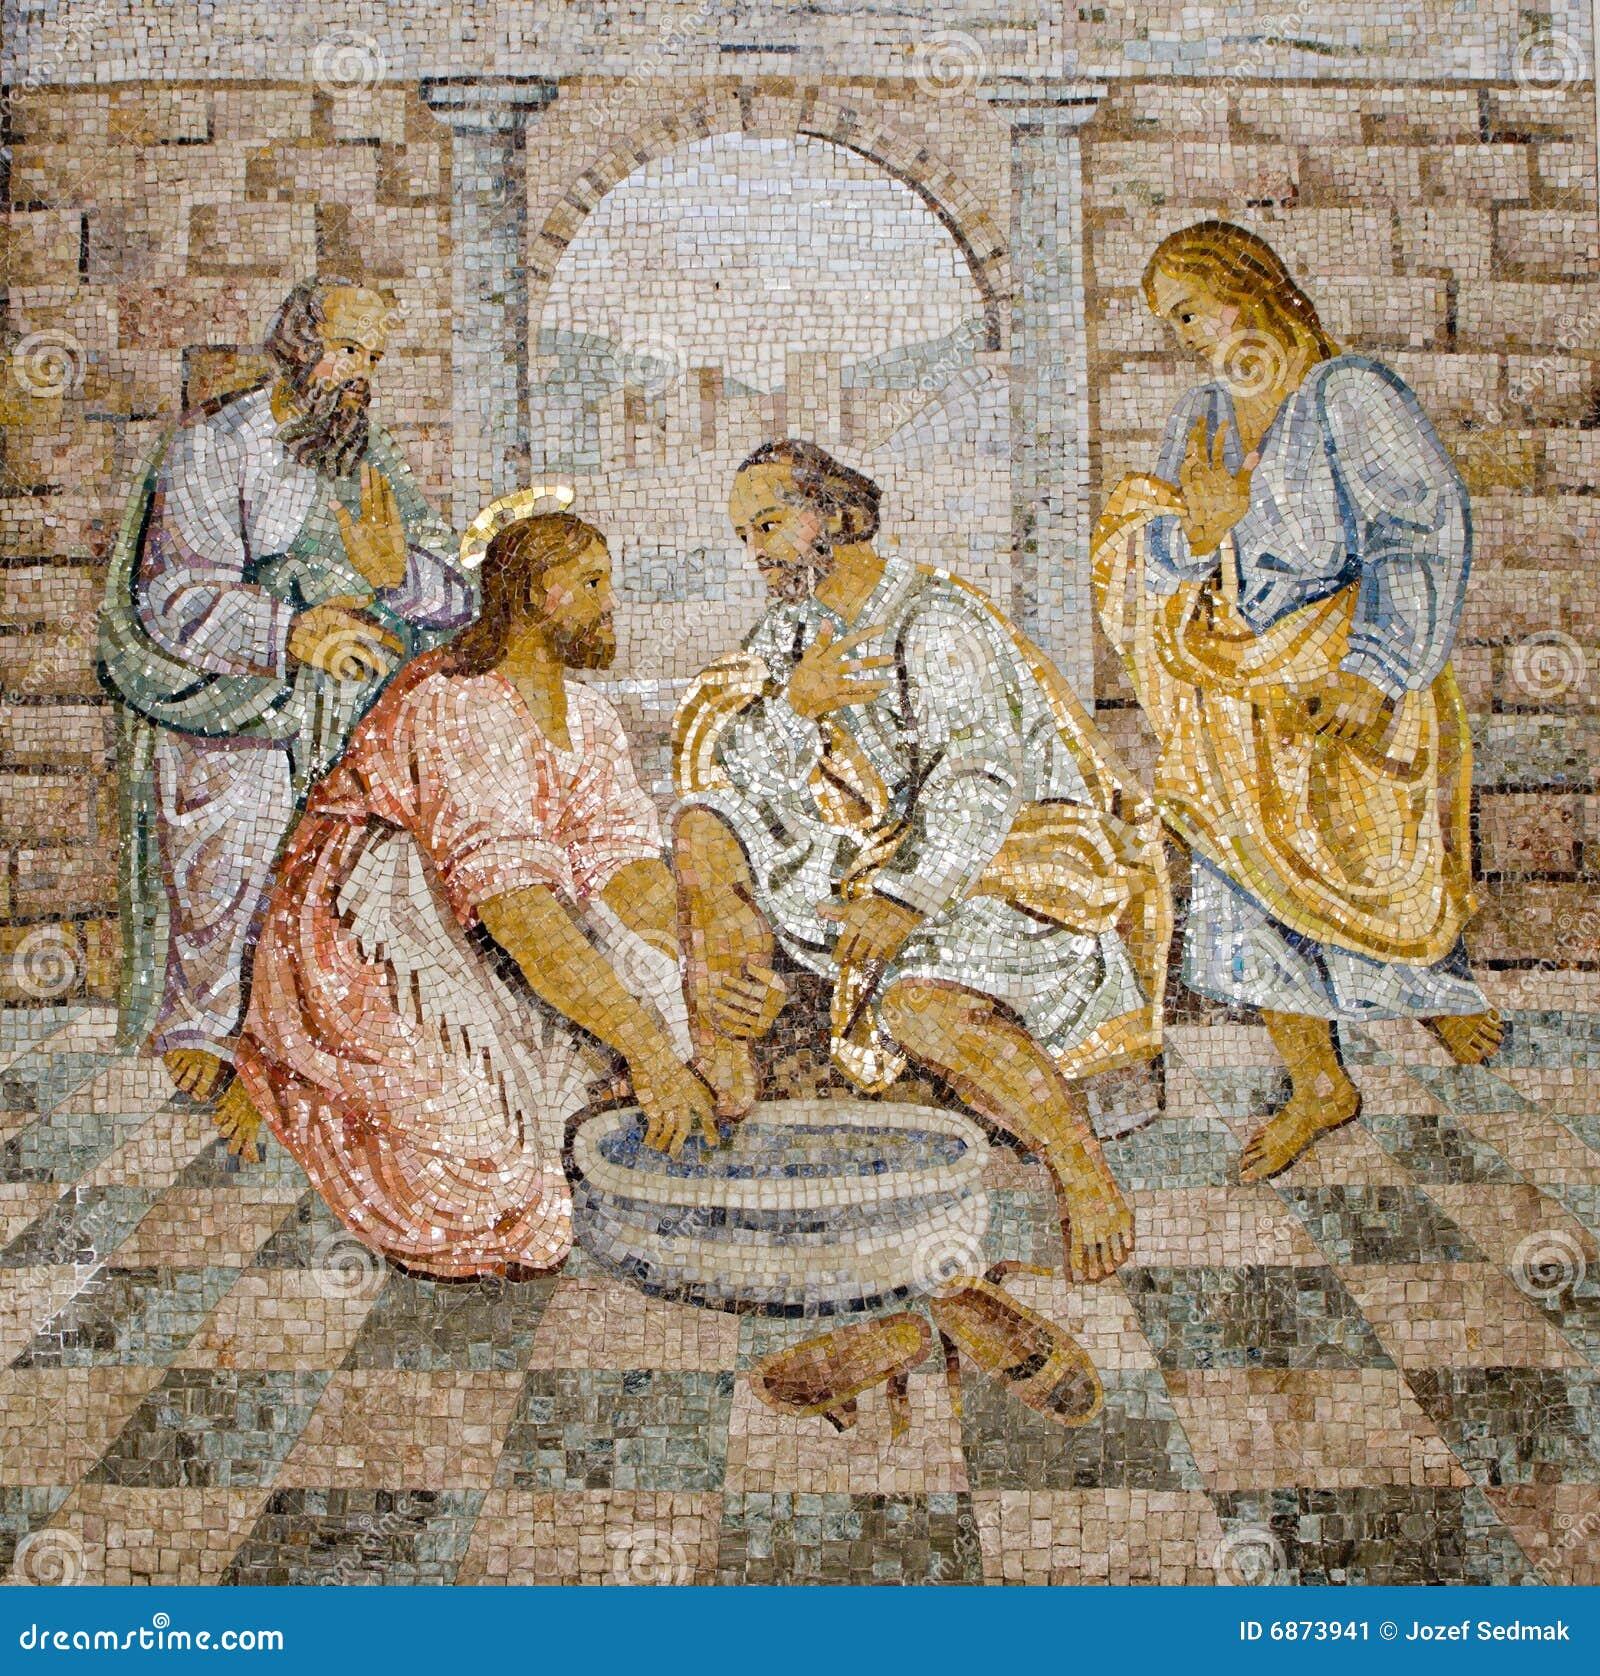 Rome - mosaic of feet washing